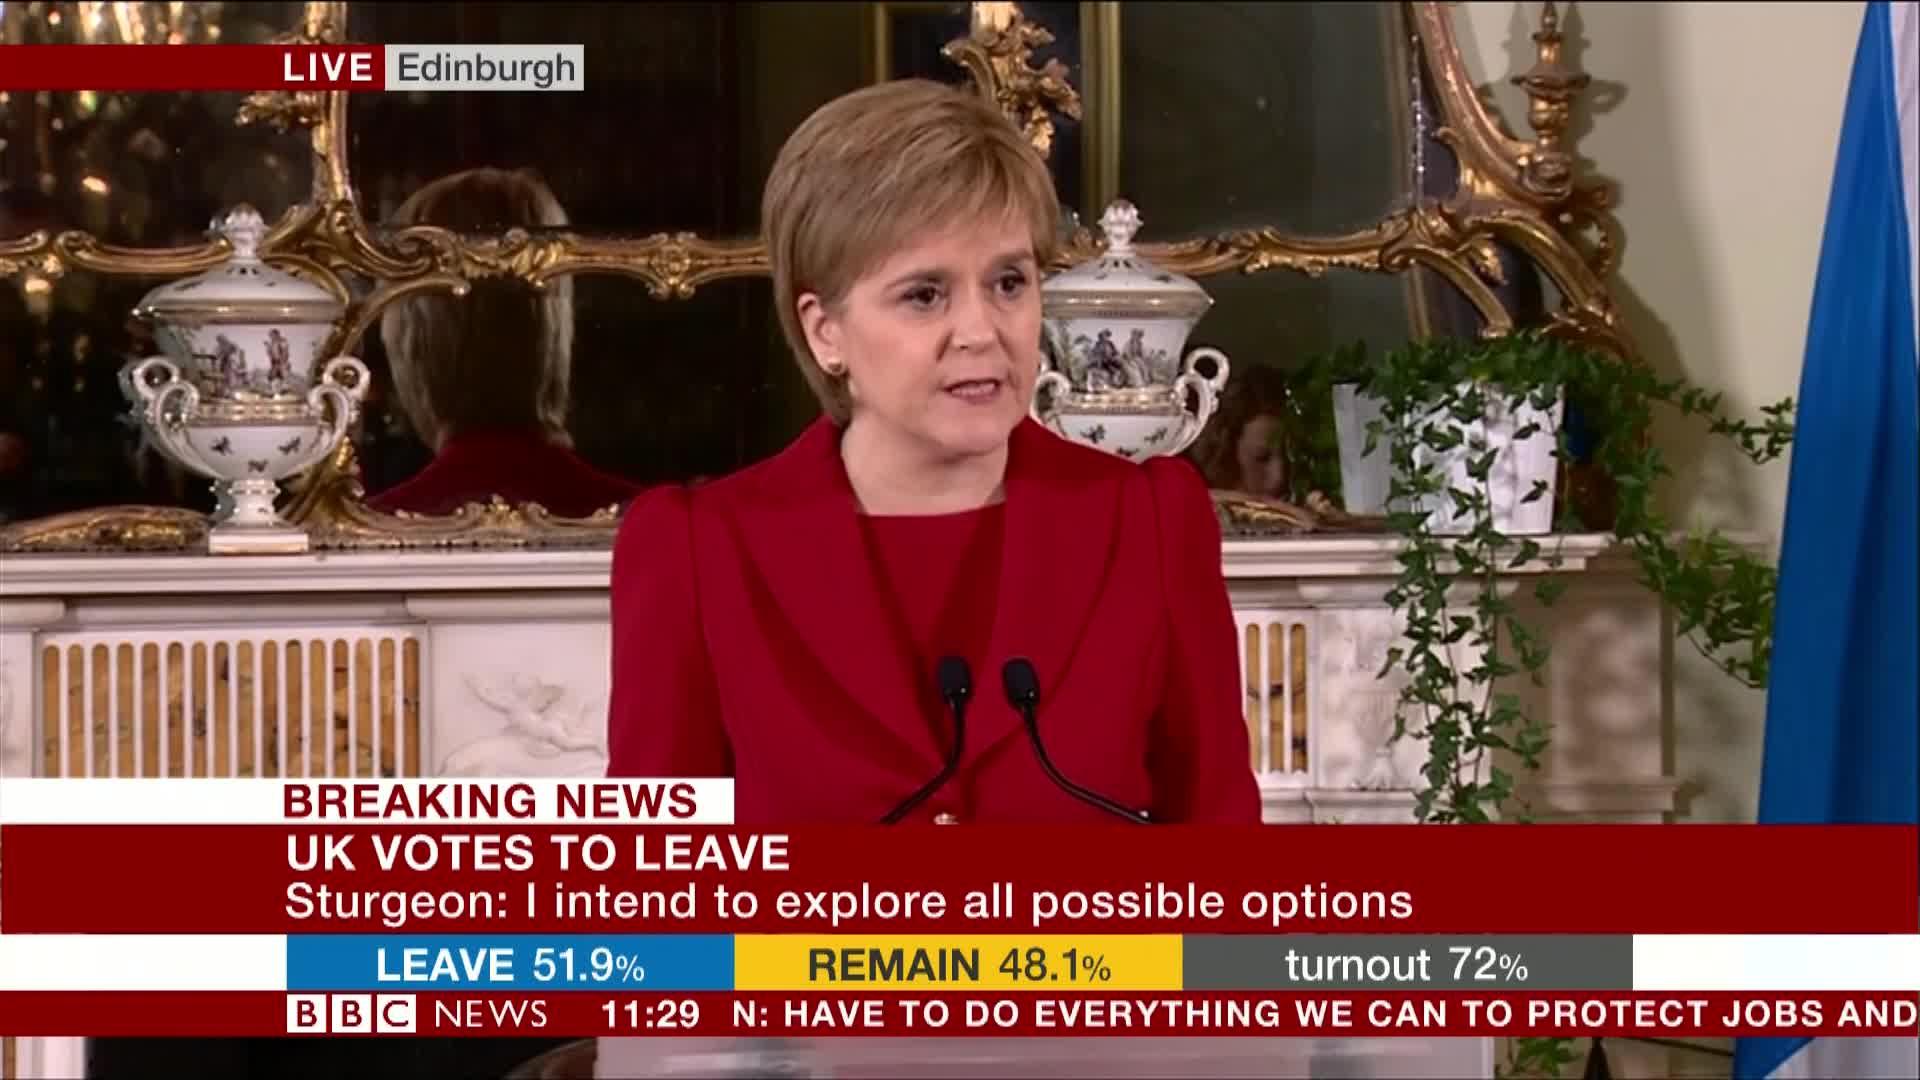 Nicola Sturgeon 'to prepare for new Scottish independence referendum'